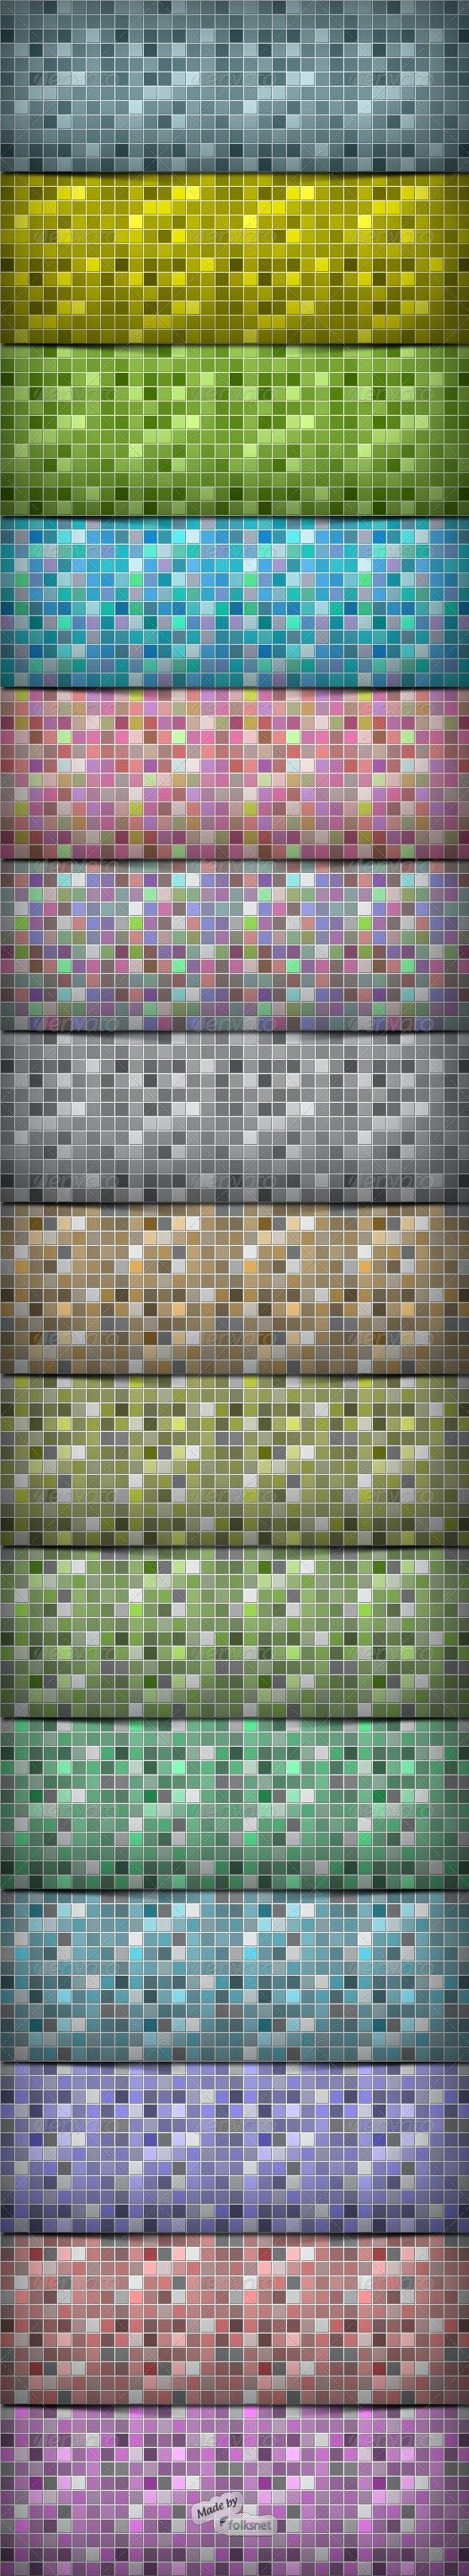 Mozaic Textures 1.0 - Art Textures